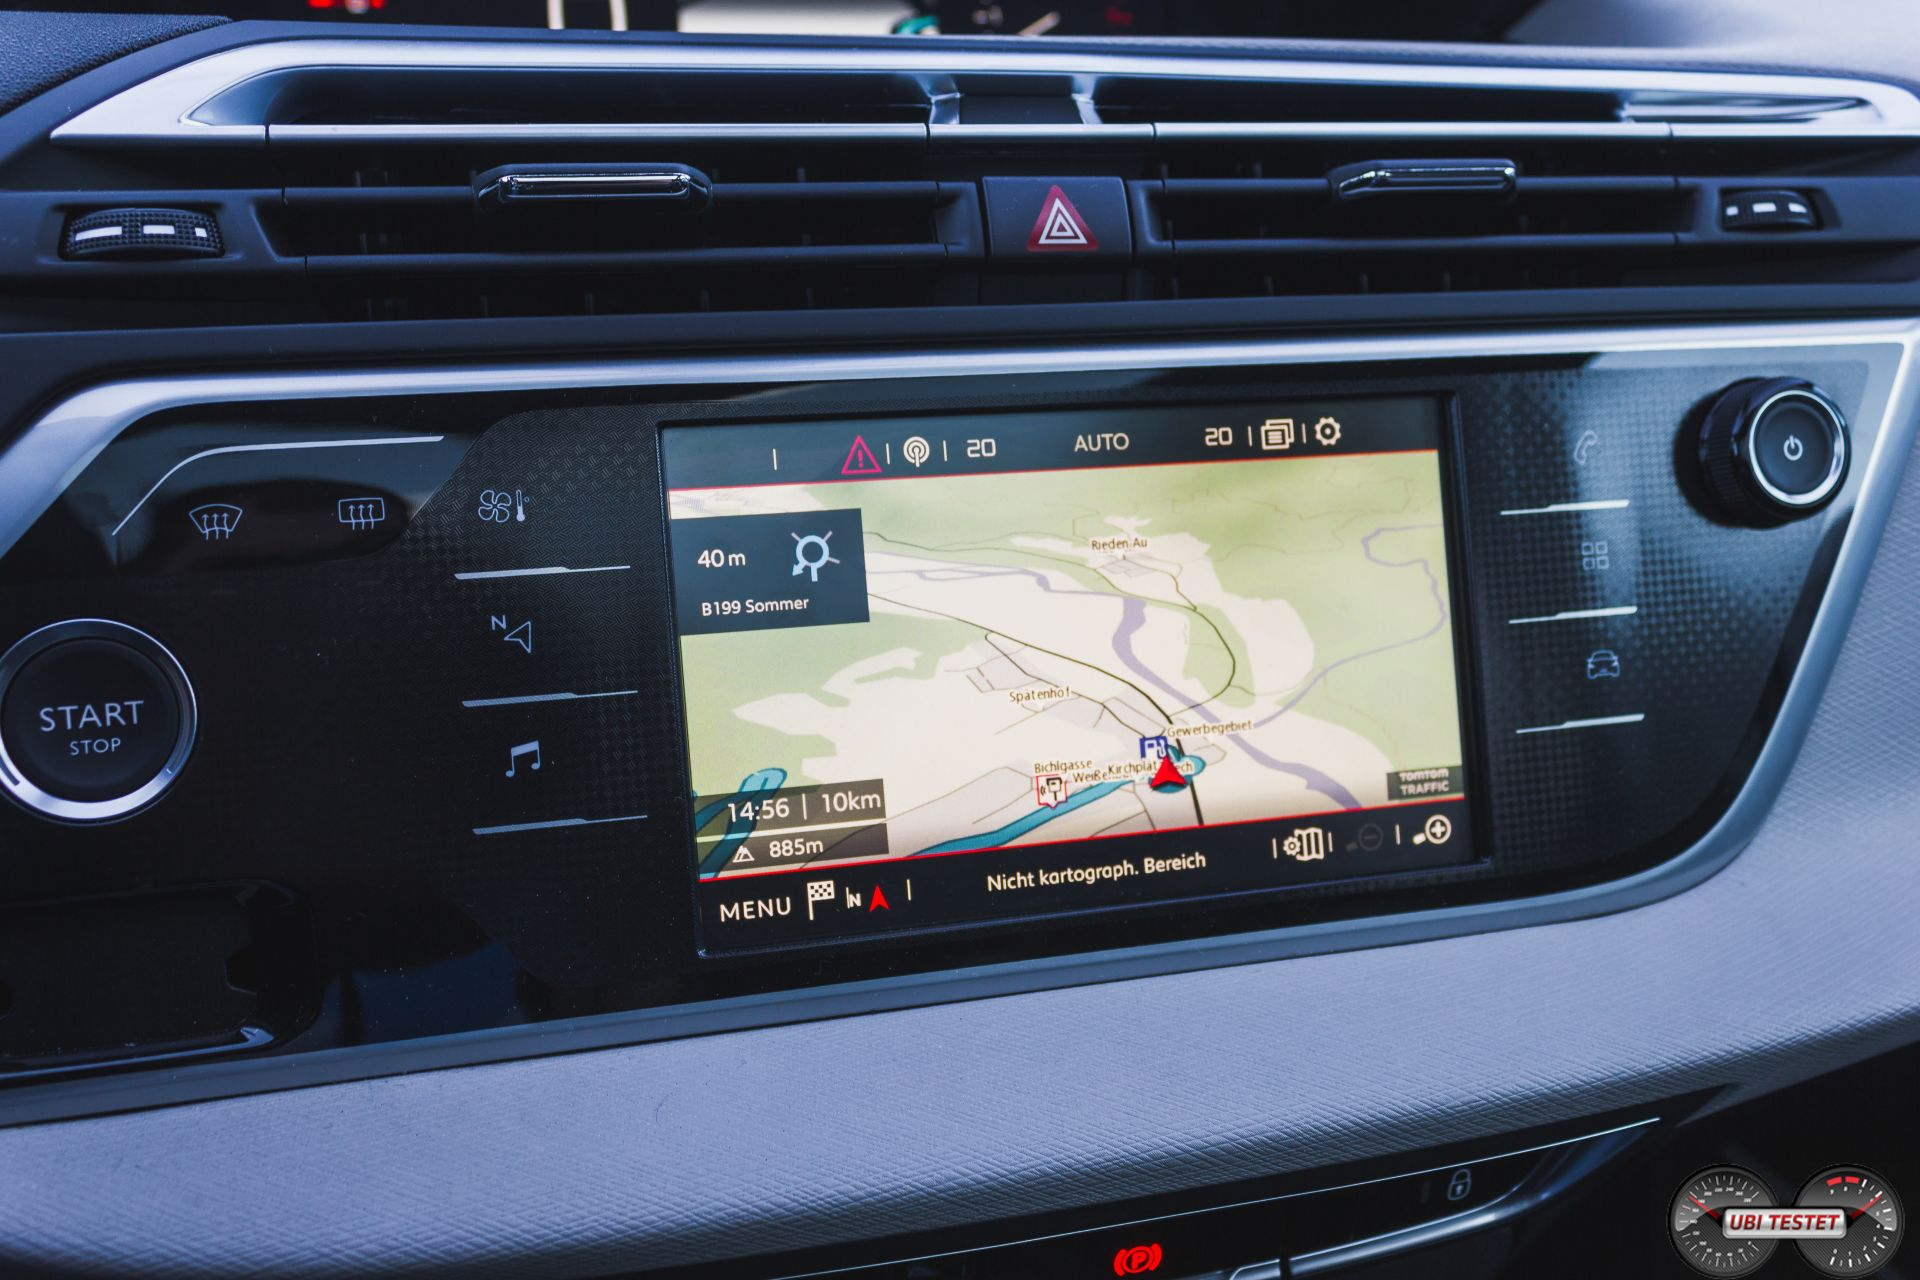 Citroën C4 Picasso Navigationssystem